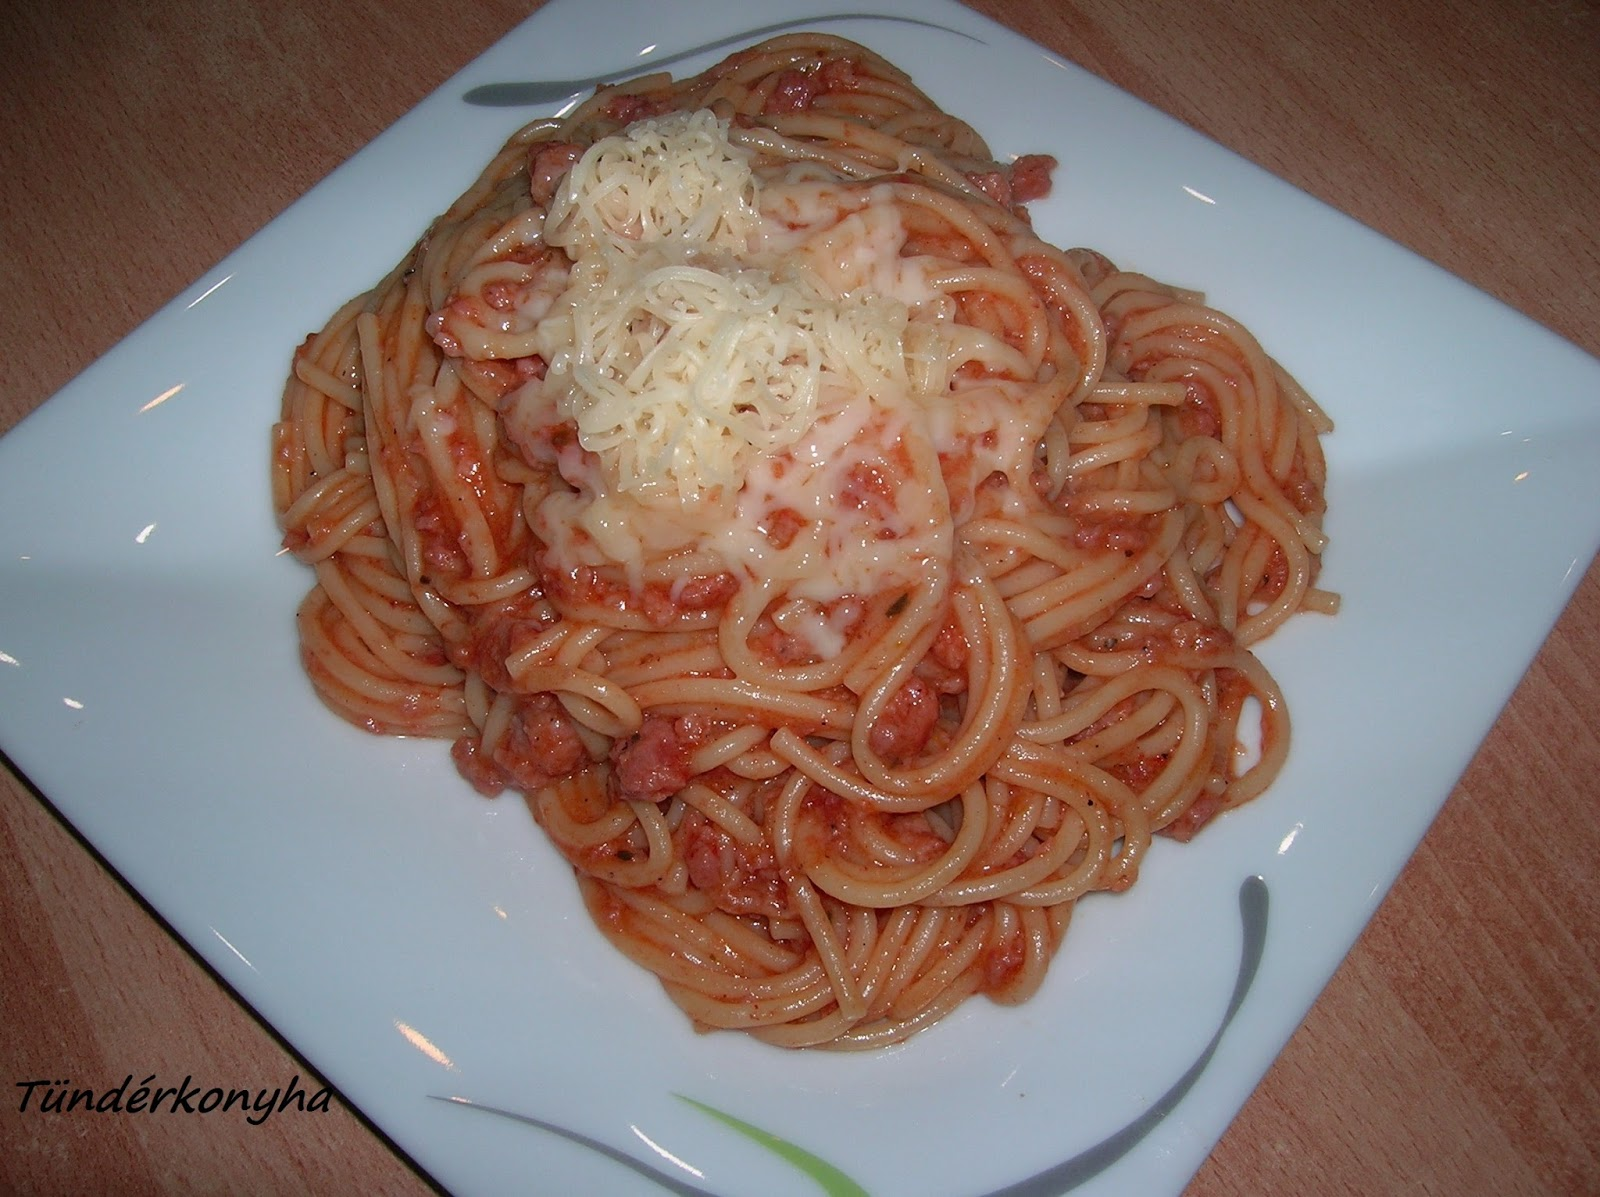 talán nem férgek hanem spagetti